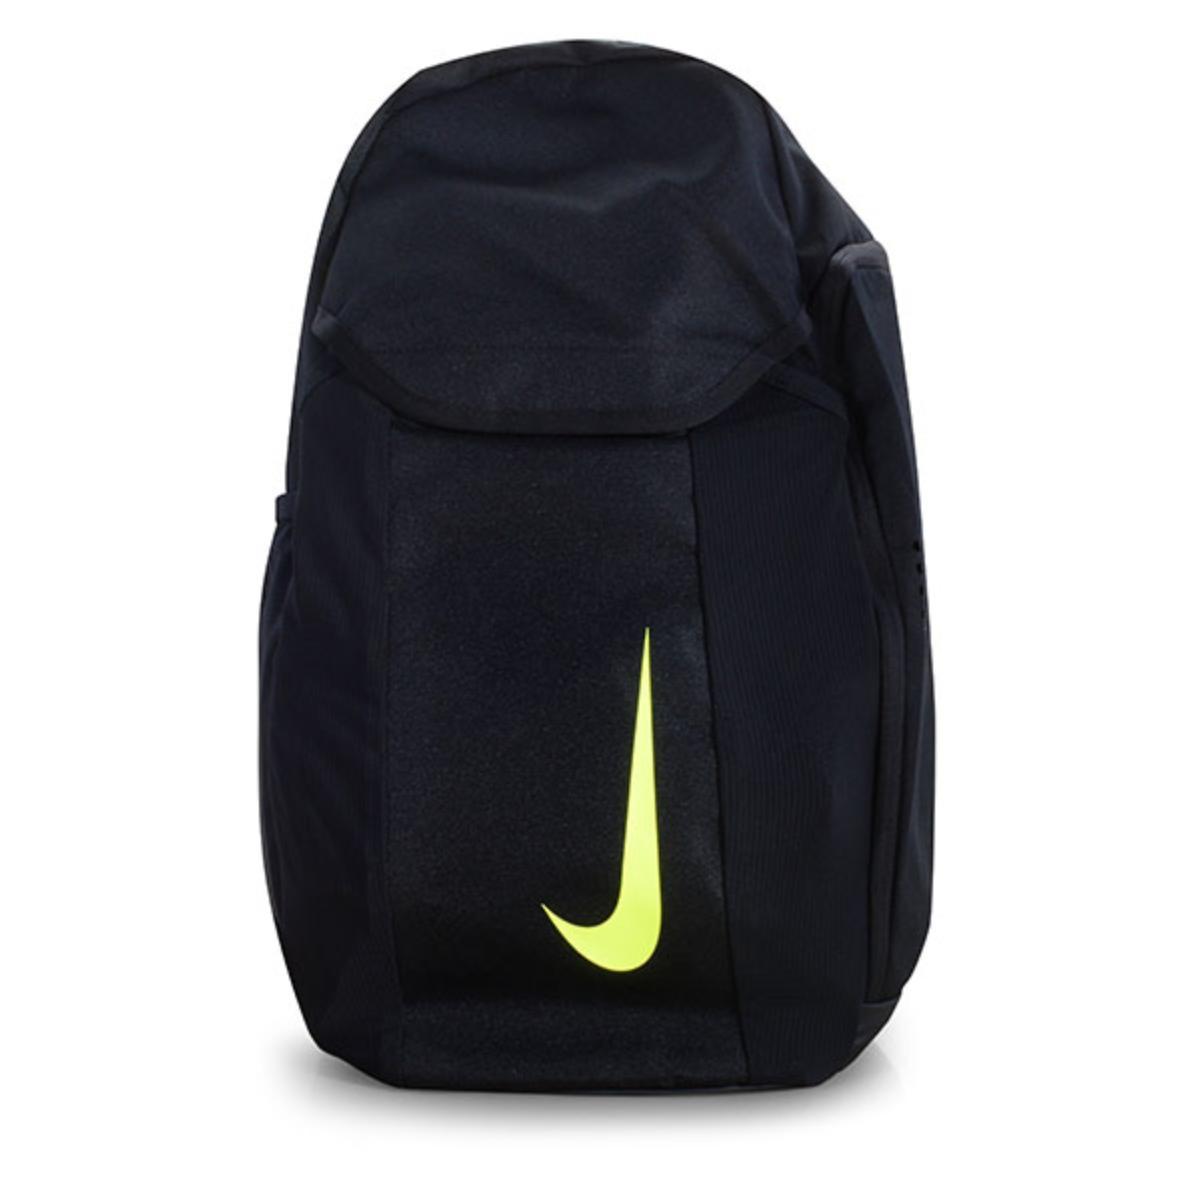 Mochila Unisex Nike Ba5508-010 Academy Bkpk Preto Limão